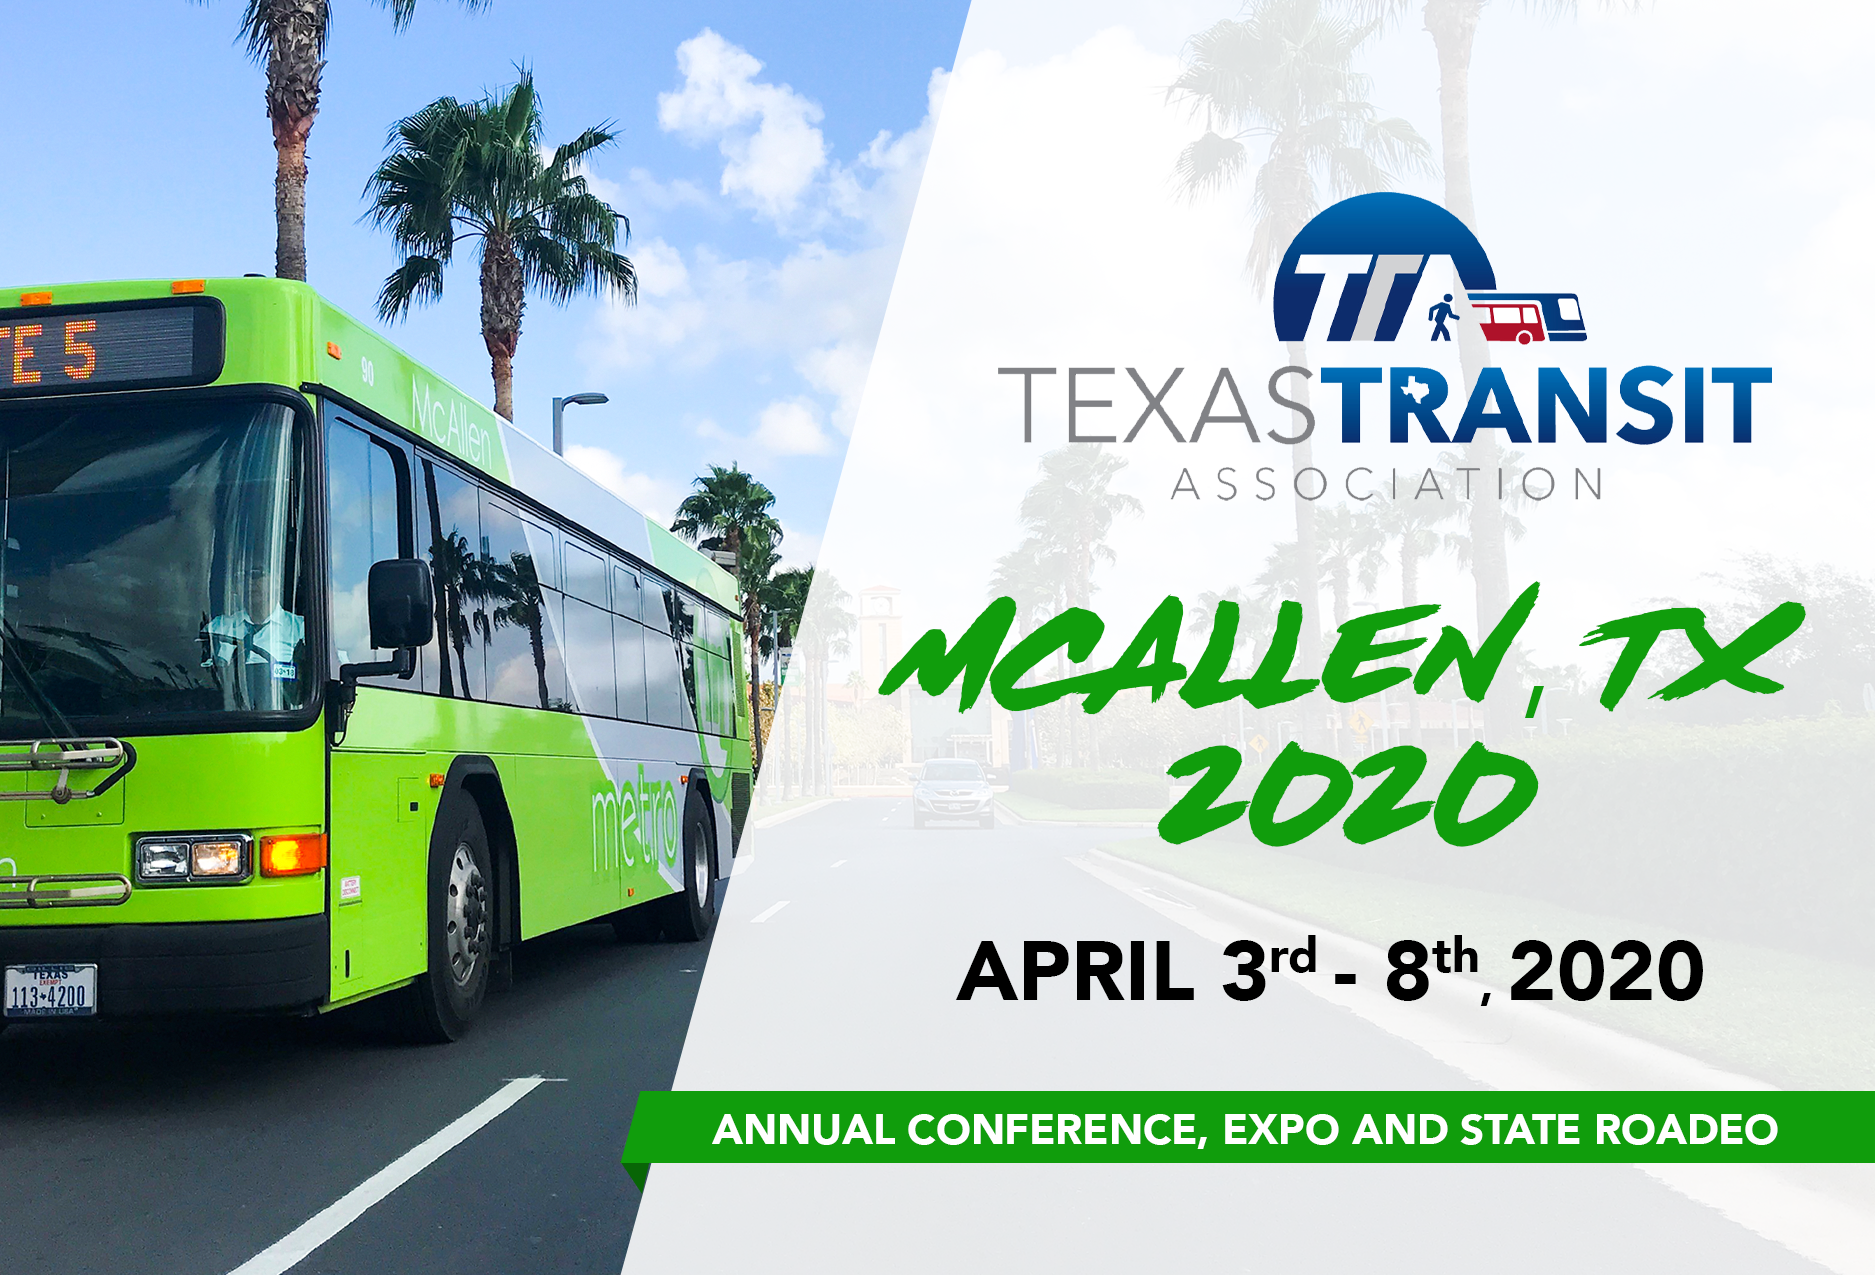 Texas Transit Association Exhibitor & Sponsorship Opportunities 2020